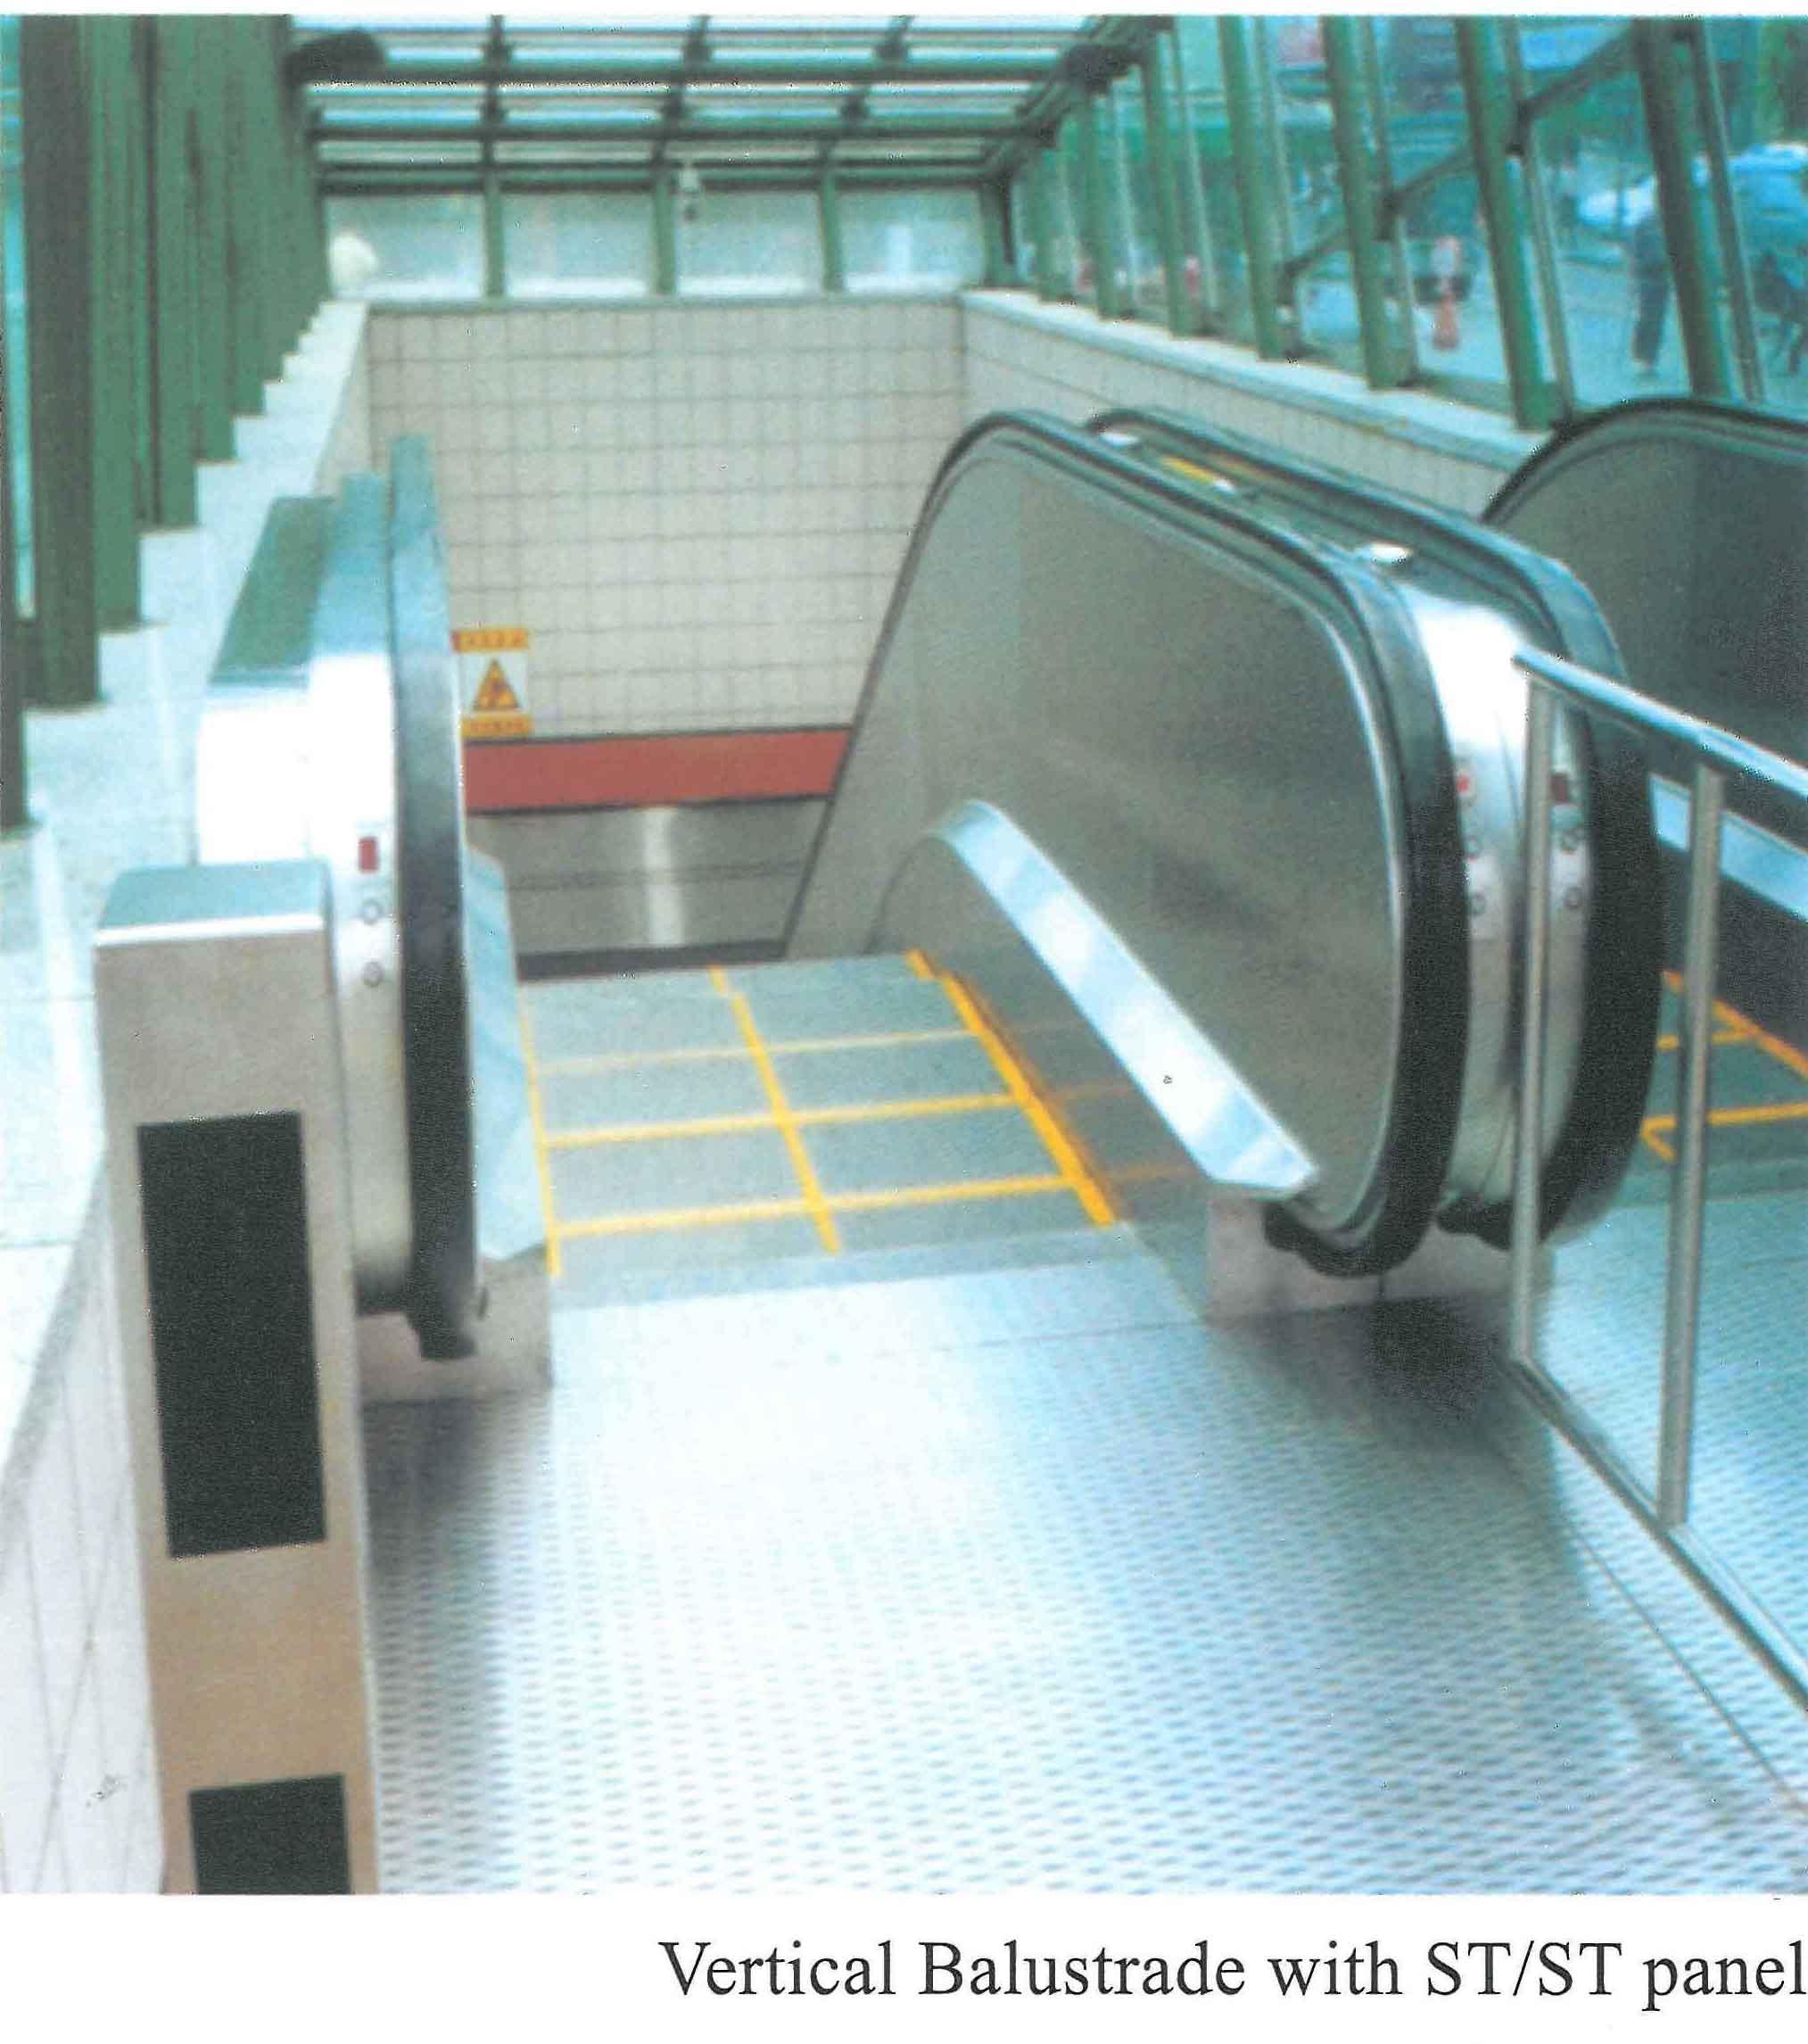 Gulf Elevators Amp Escalators Co